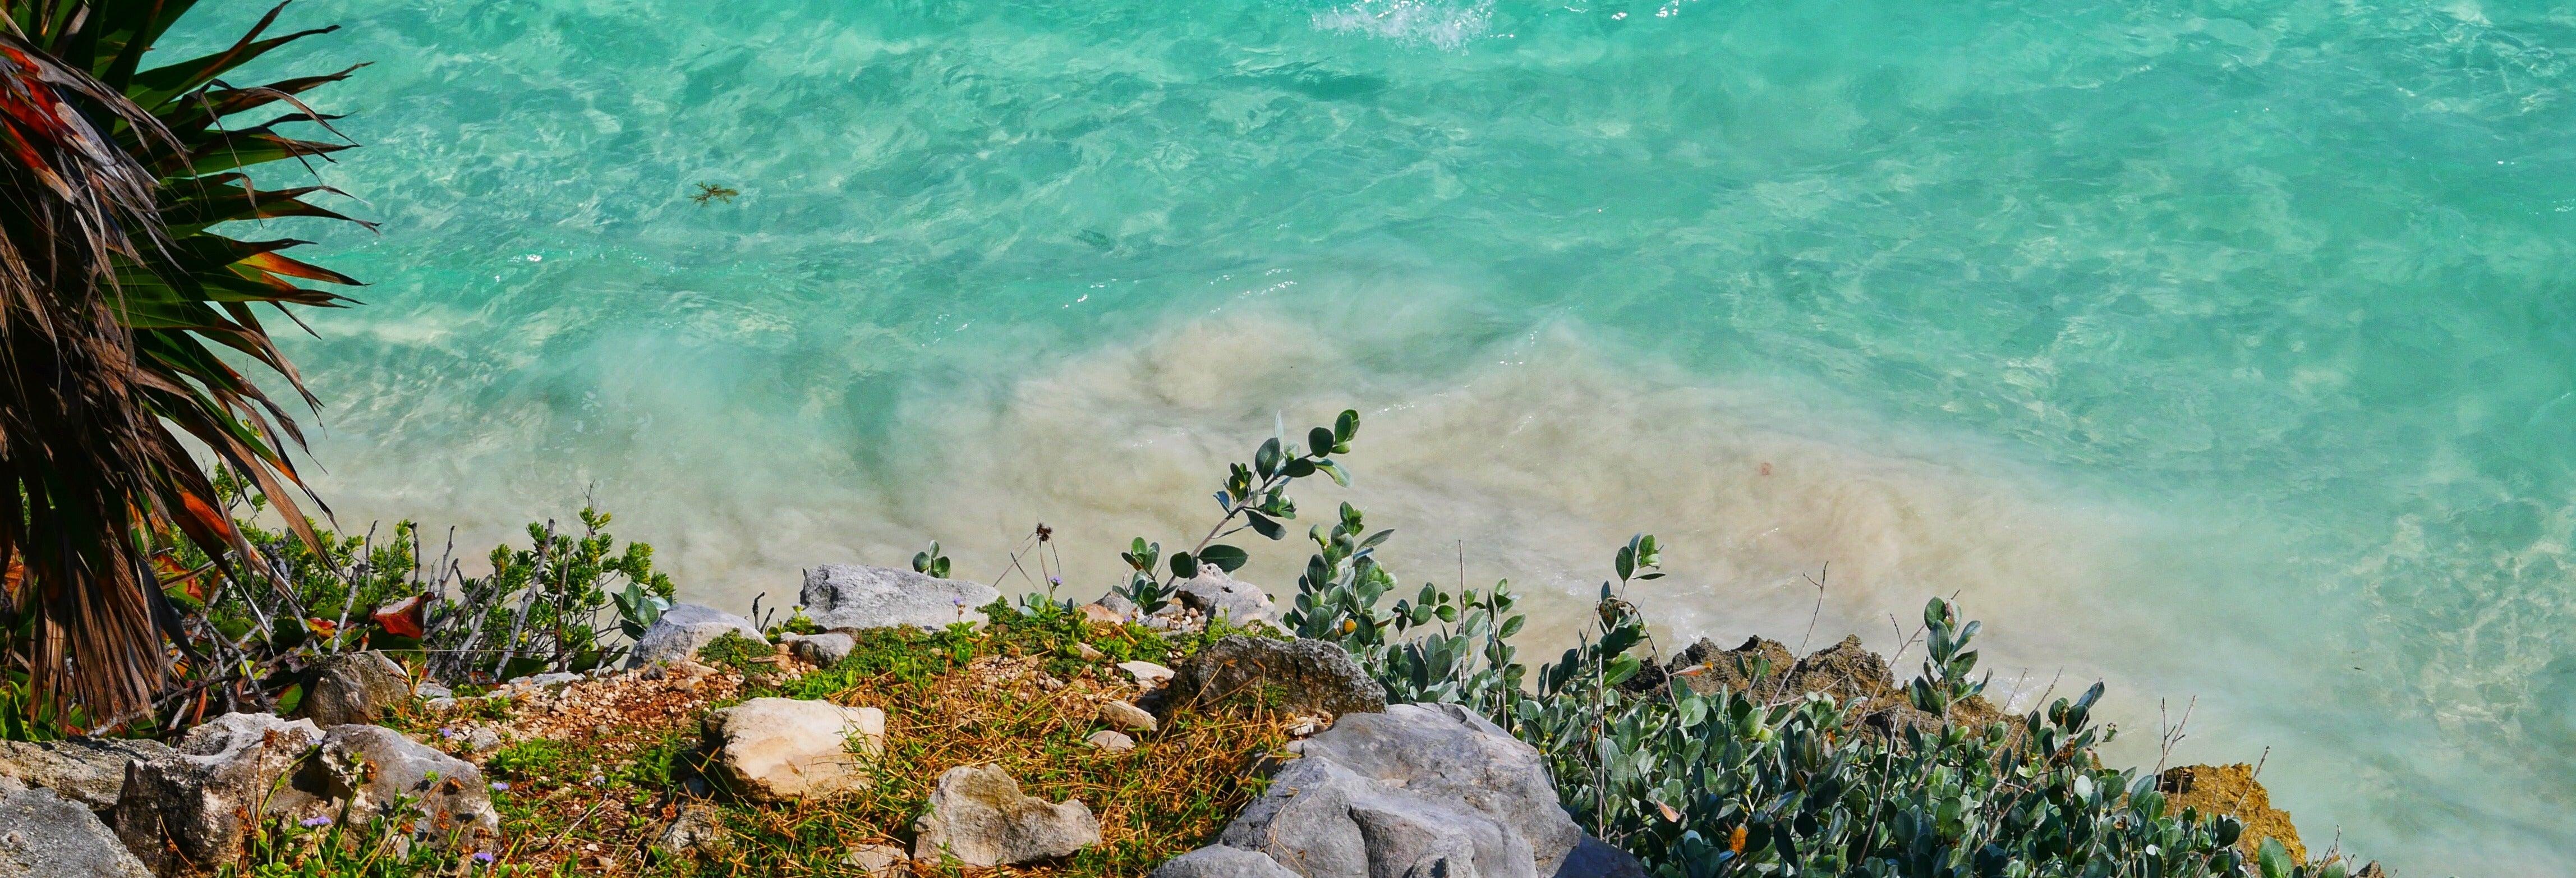 Snorkel em Tulum e Chikin Ha